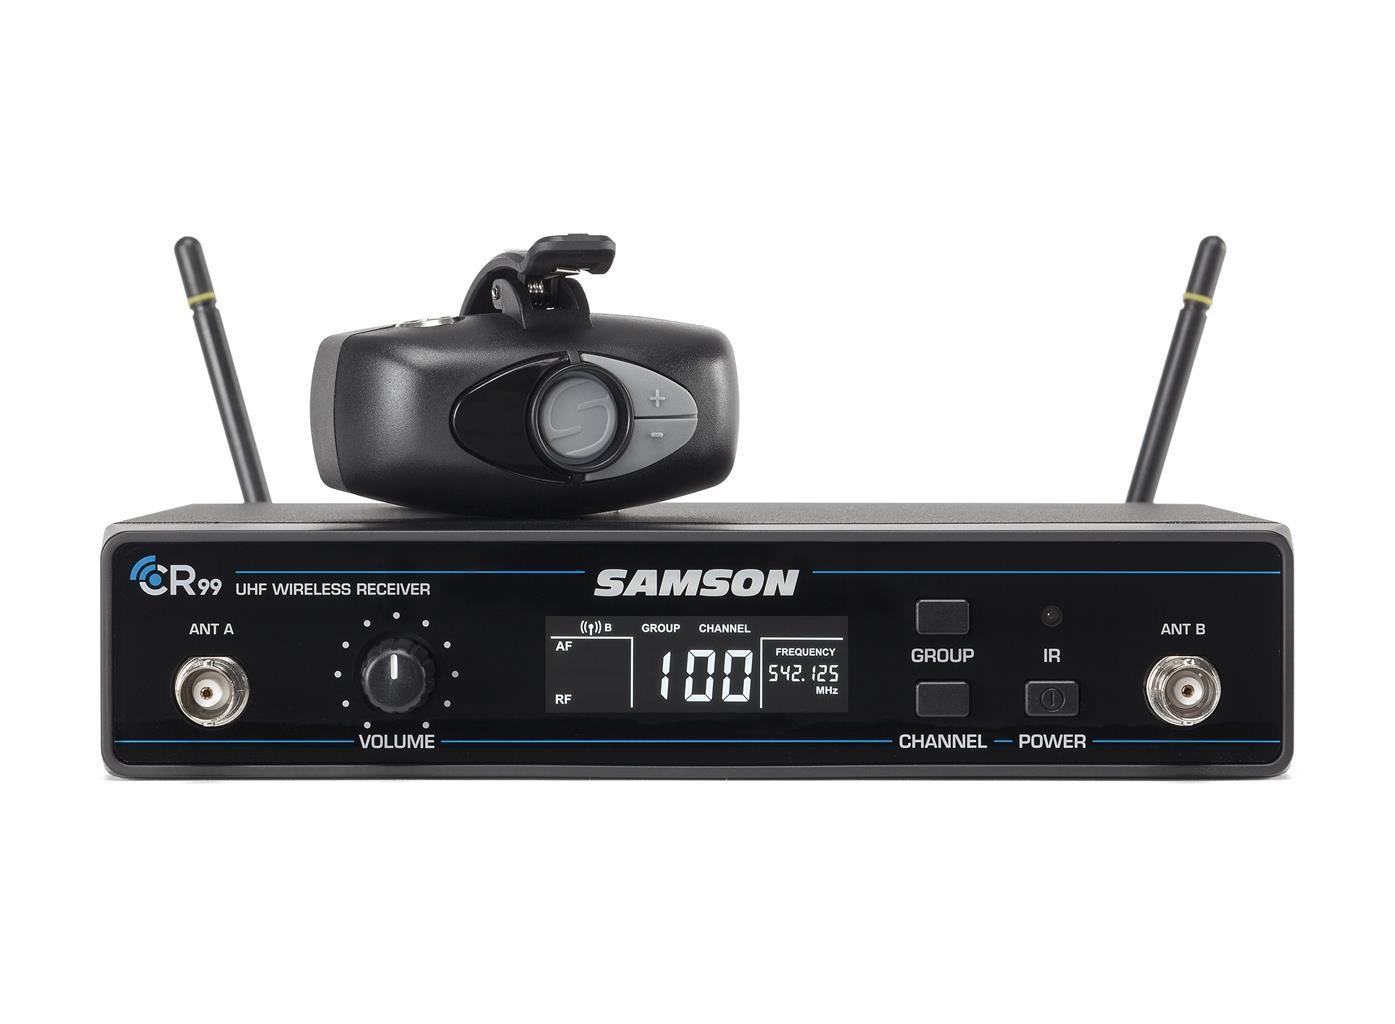 Samson-Airline-AHX-headset-sku-7649290649003